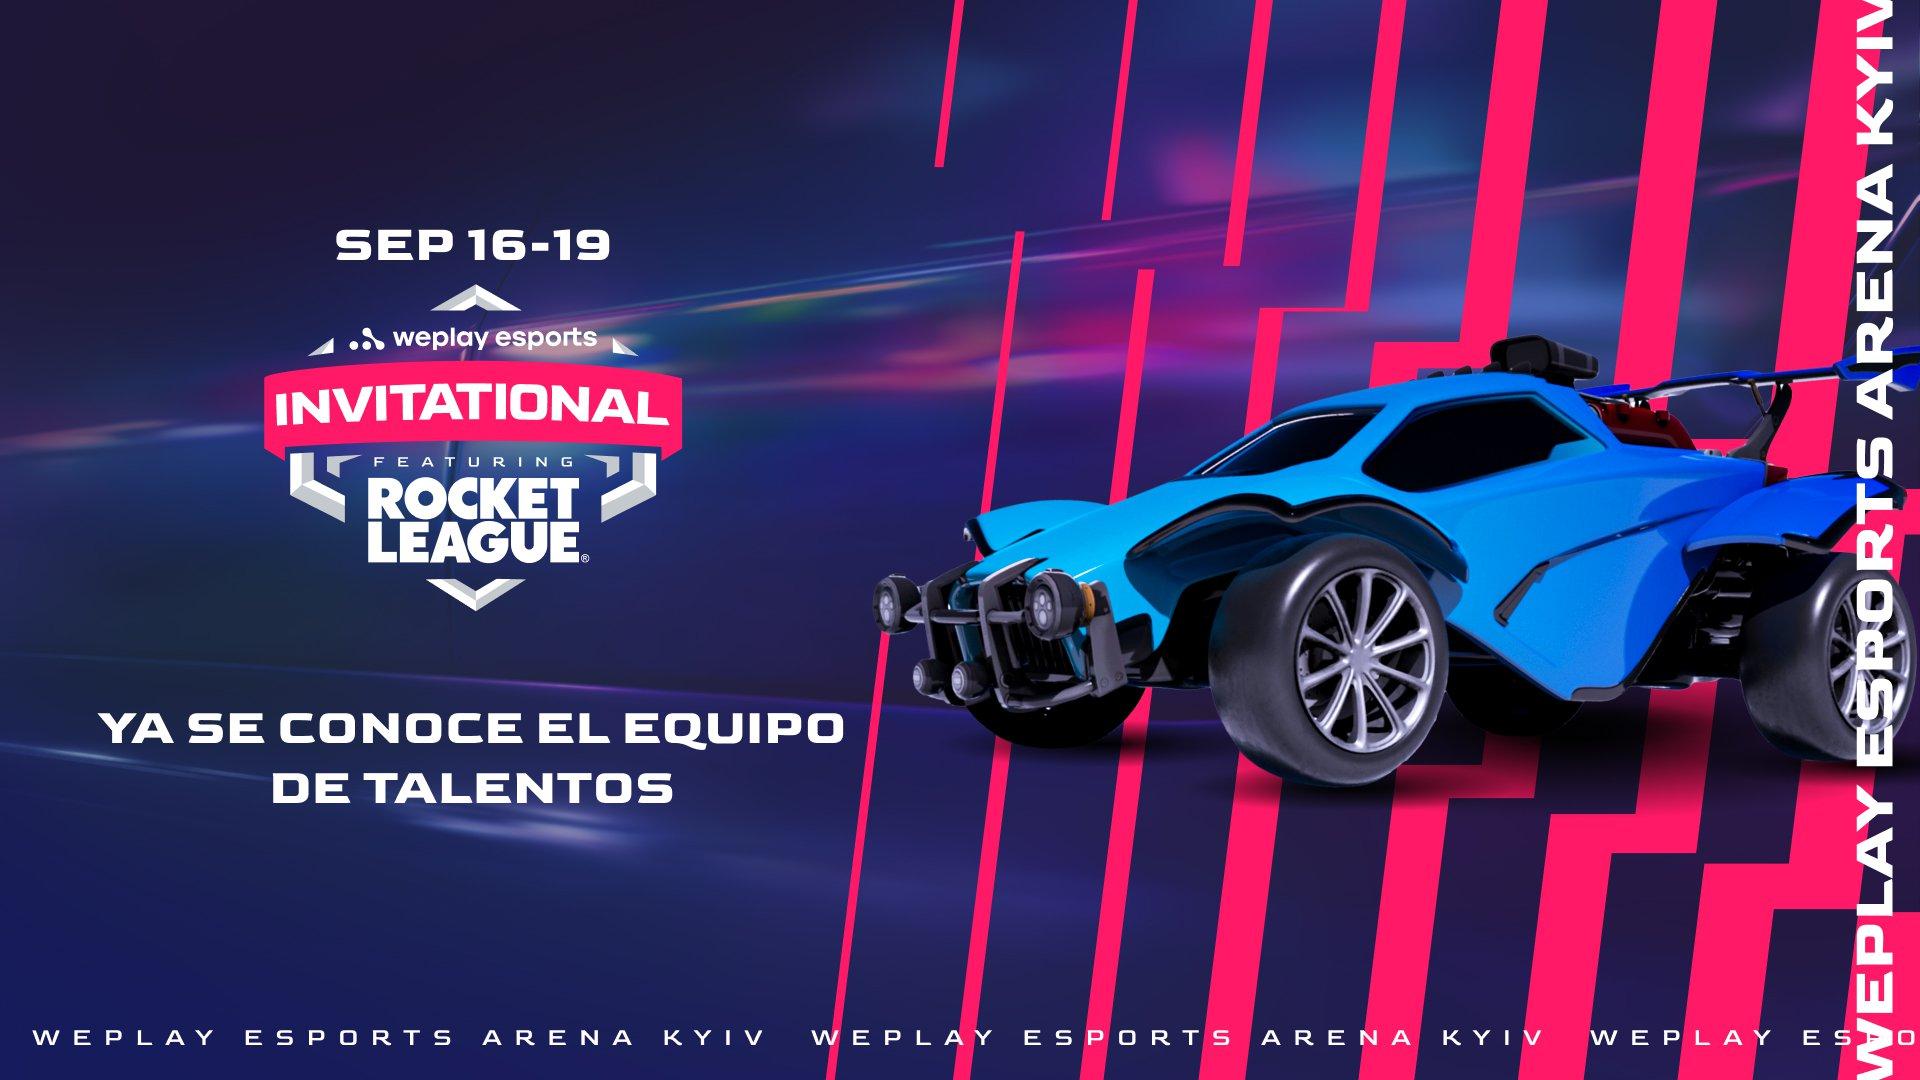 Equipo de talentos del WePlay Esports Invitational. Imagen: WePlay Holding